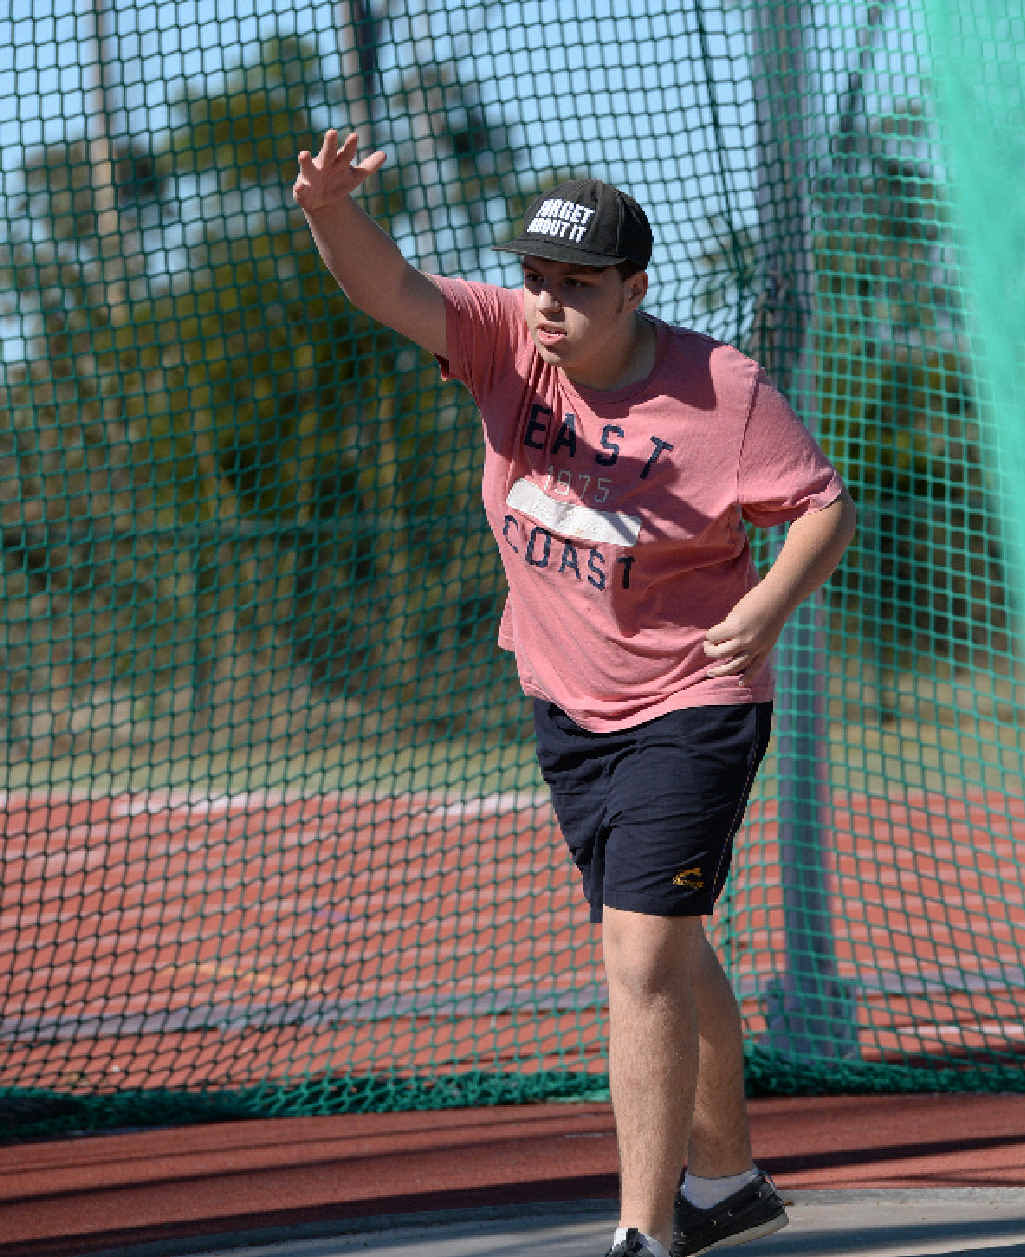 Tom Massingham competes in the discus.